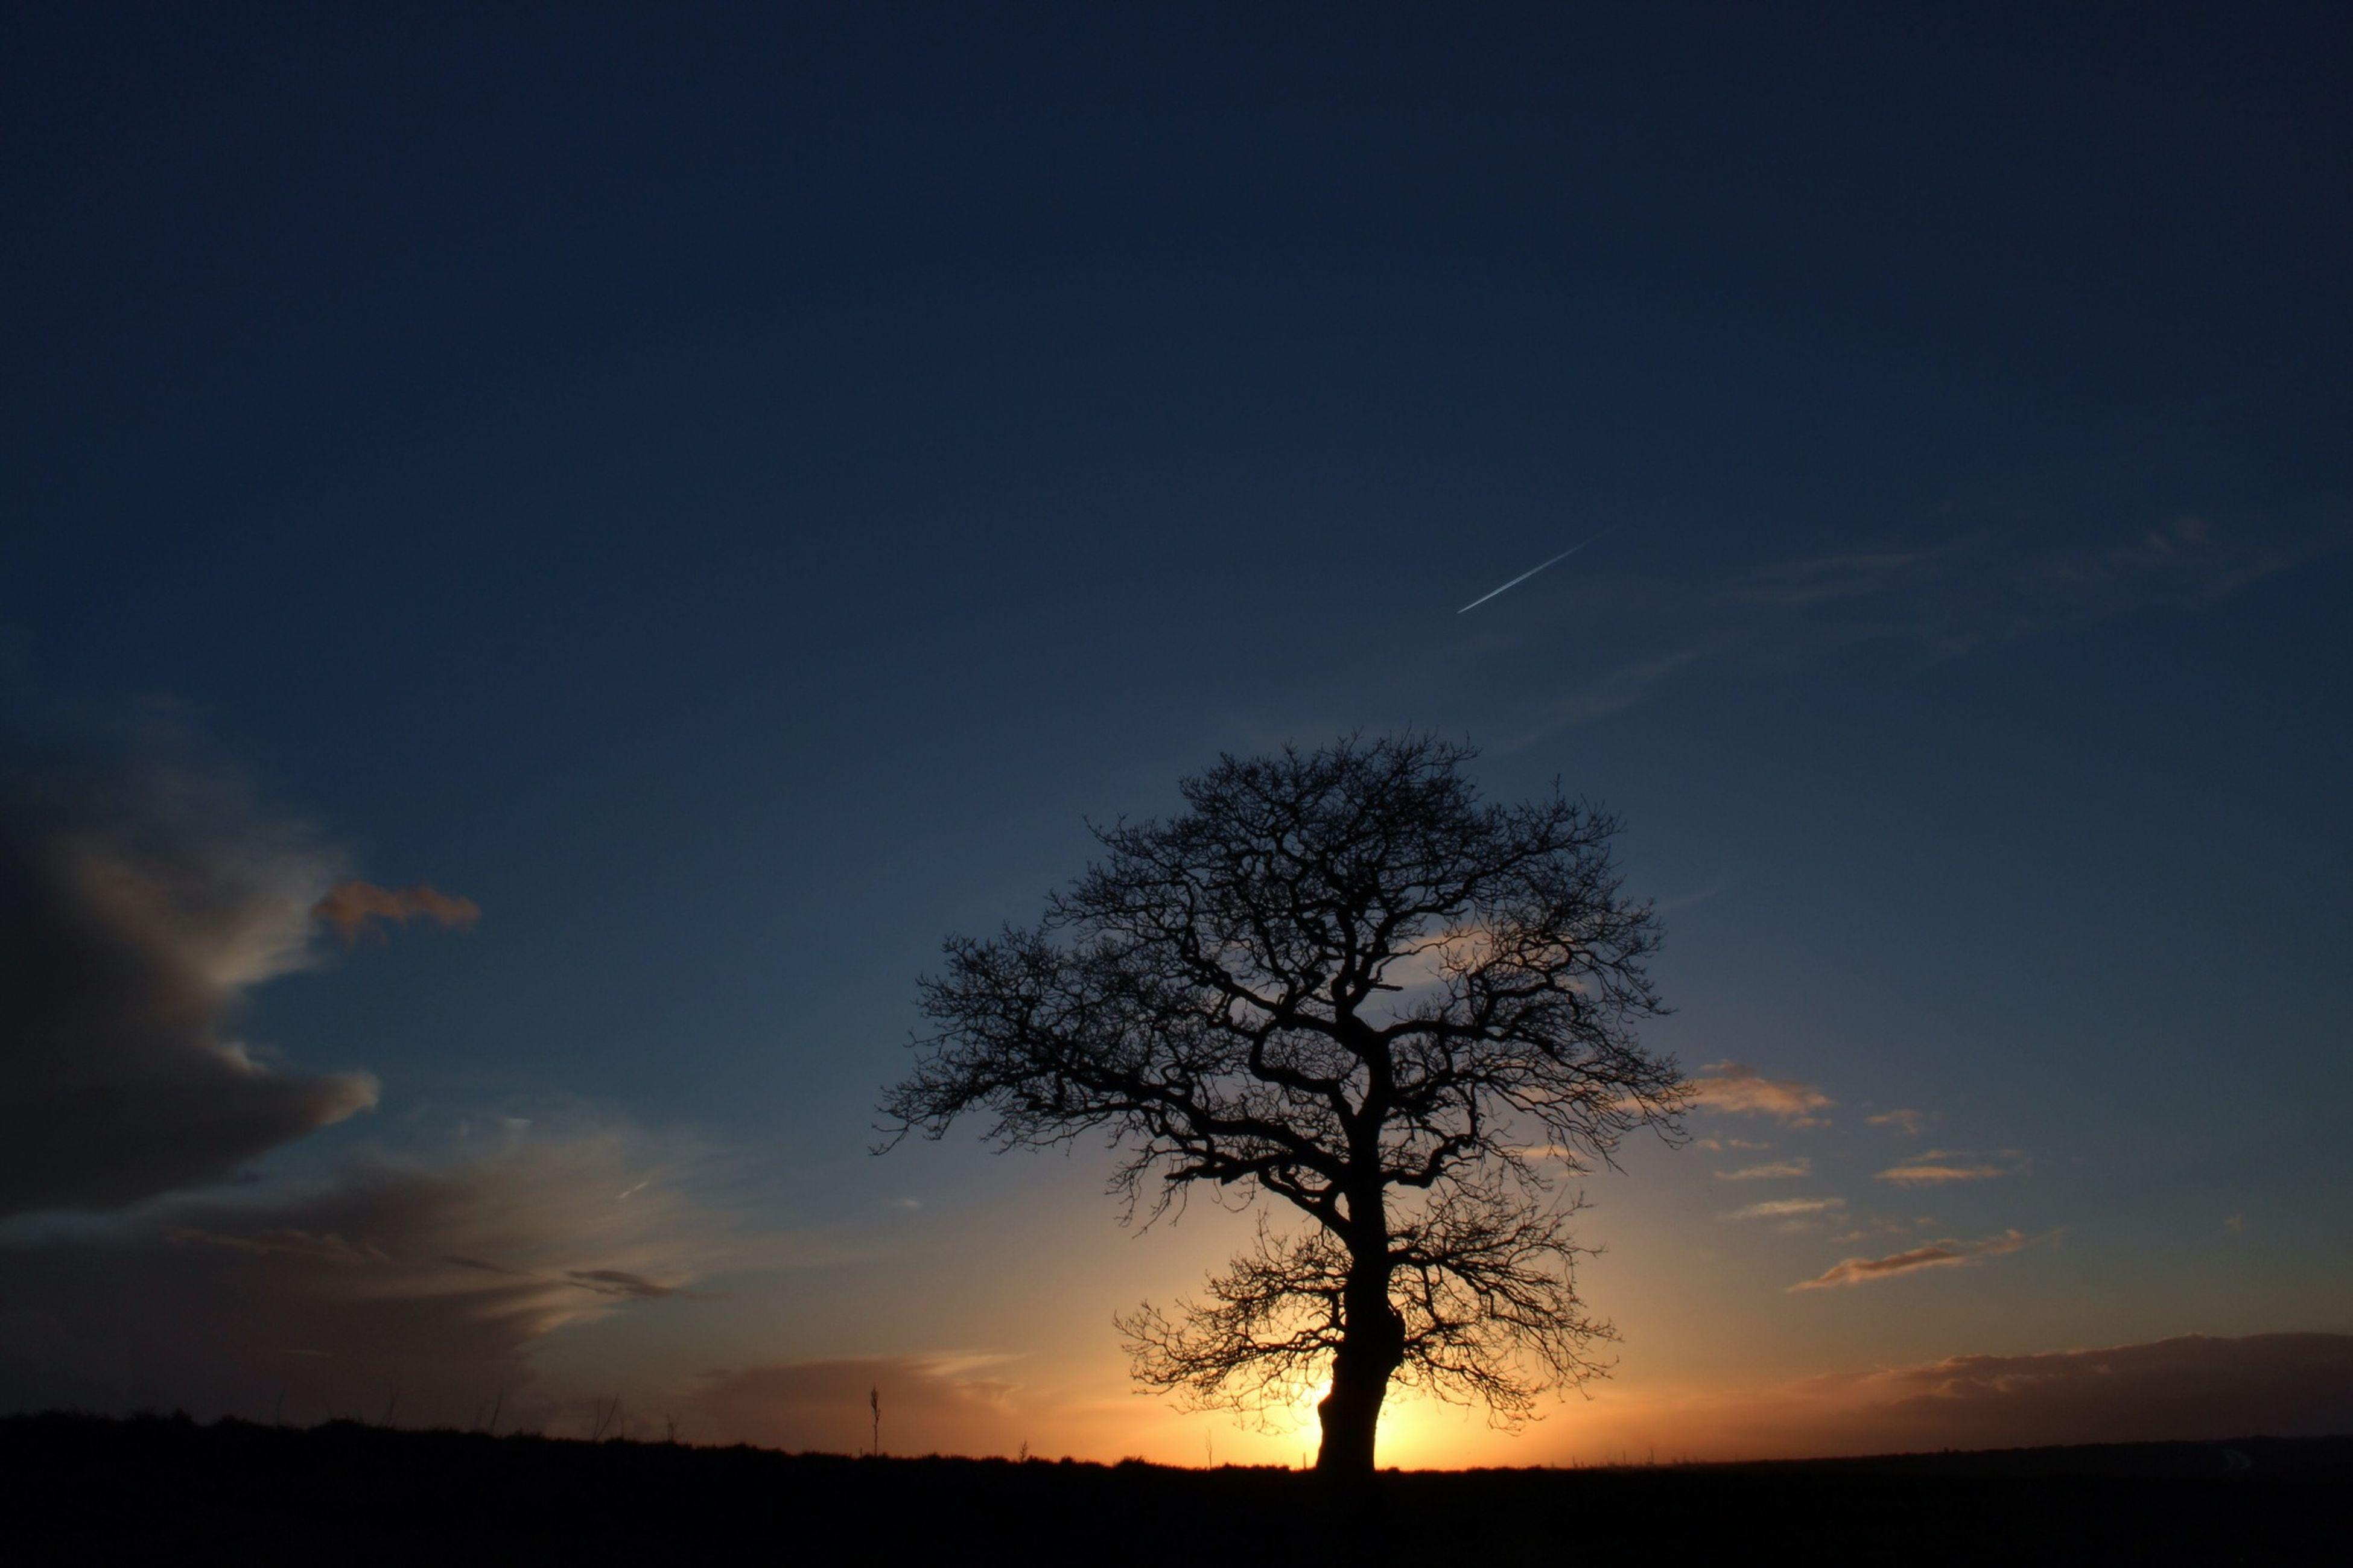 silhouette, tranquility, tranquil scene, sunset, tree, scenics, beauty in nature, sky, bare tree, landscape, nature, idyllic, field, non-urban scene, branch, non urban scene, outdoors, cloud, no people, remote